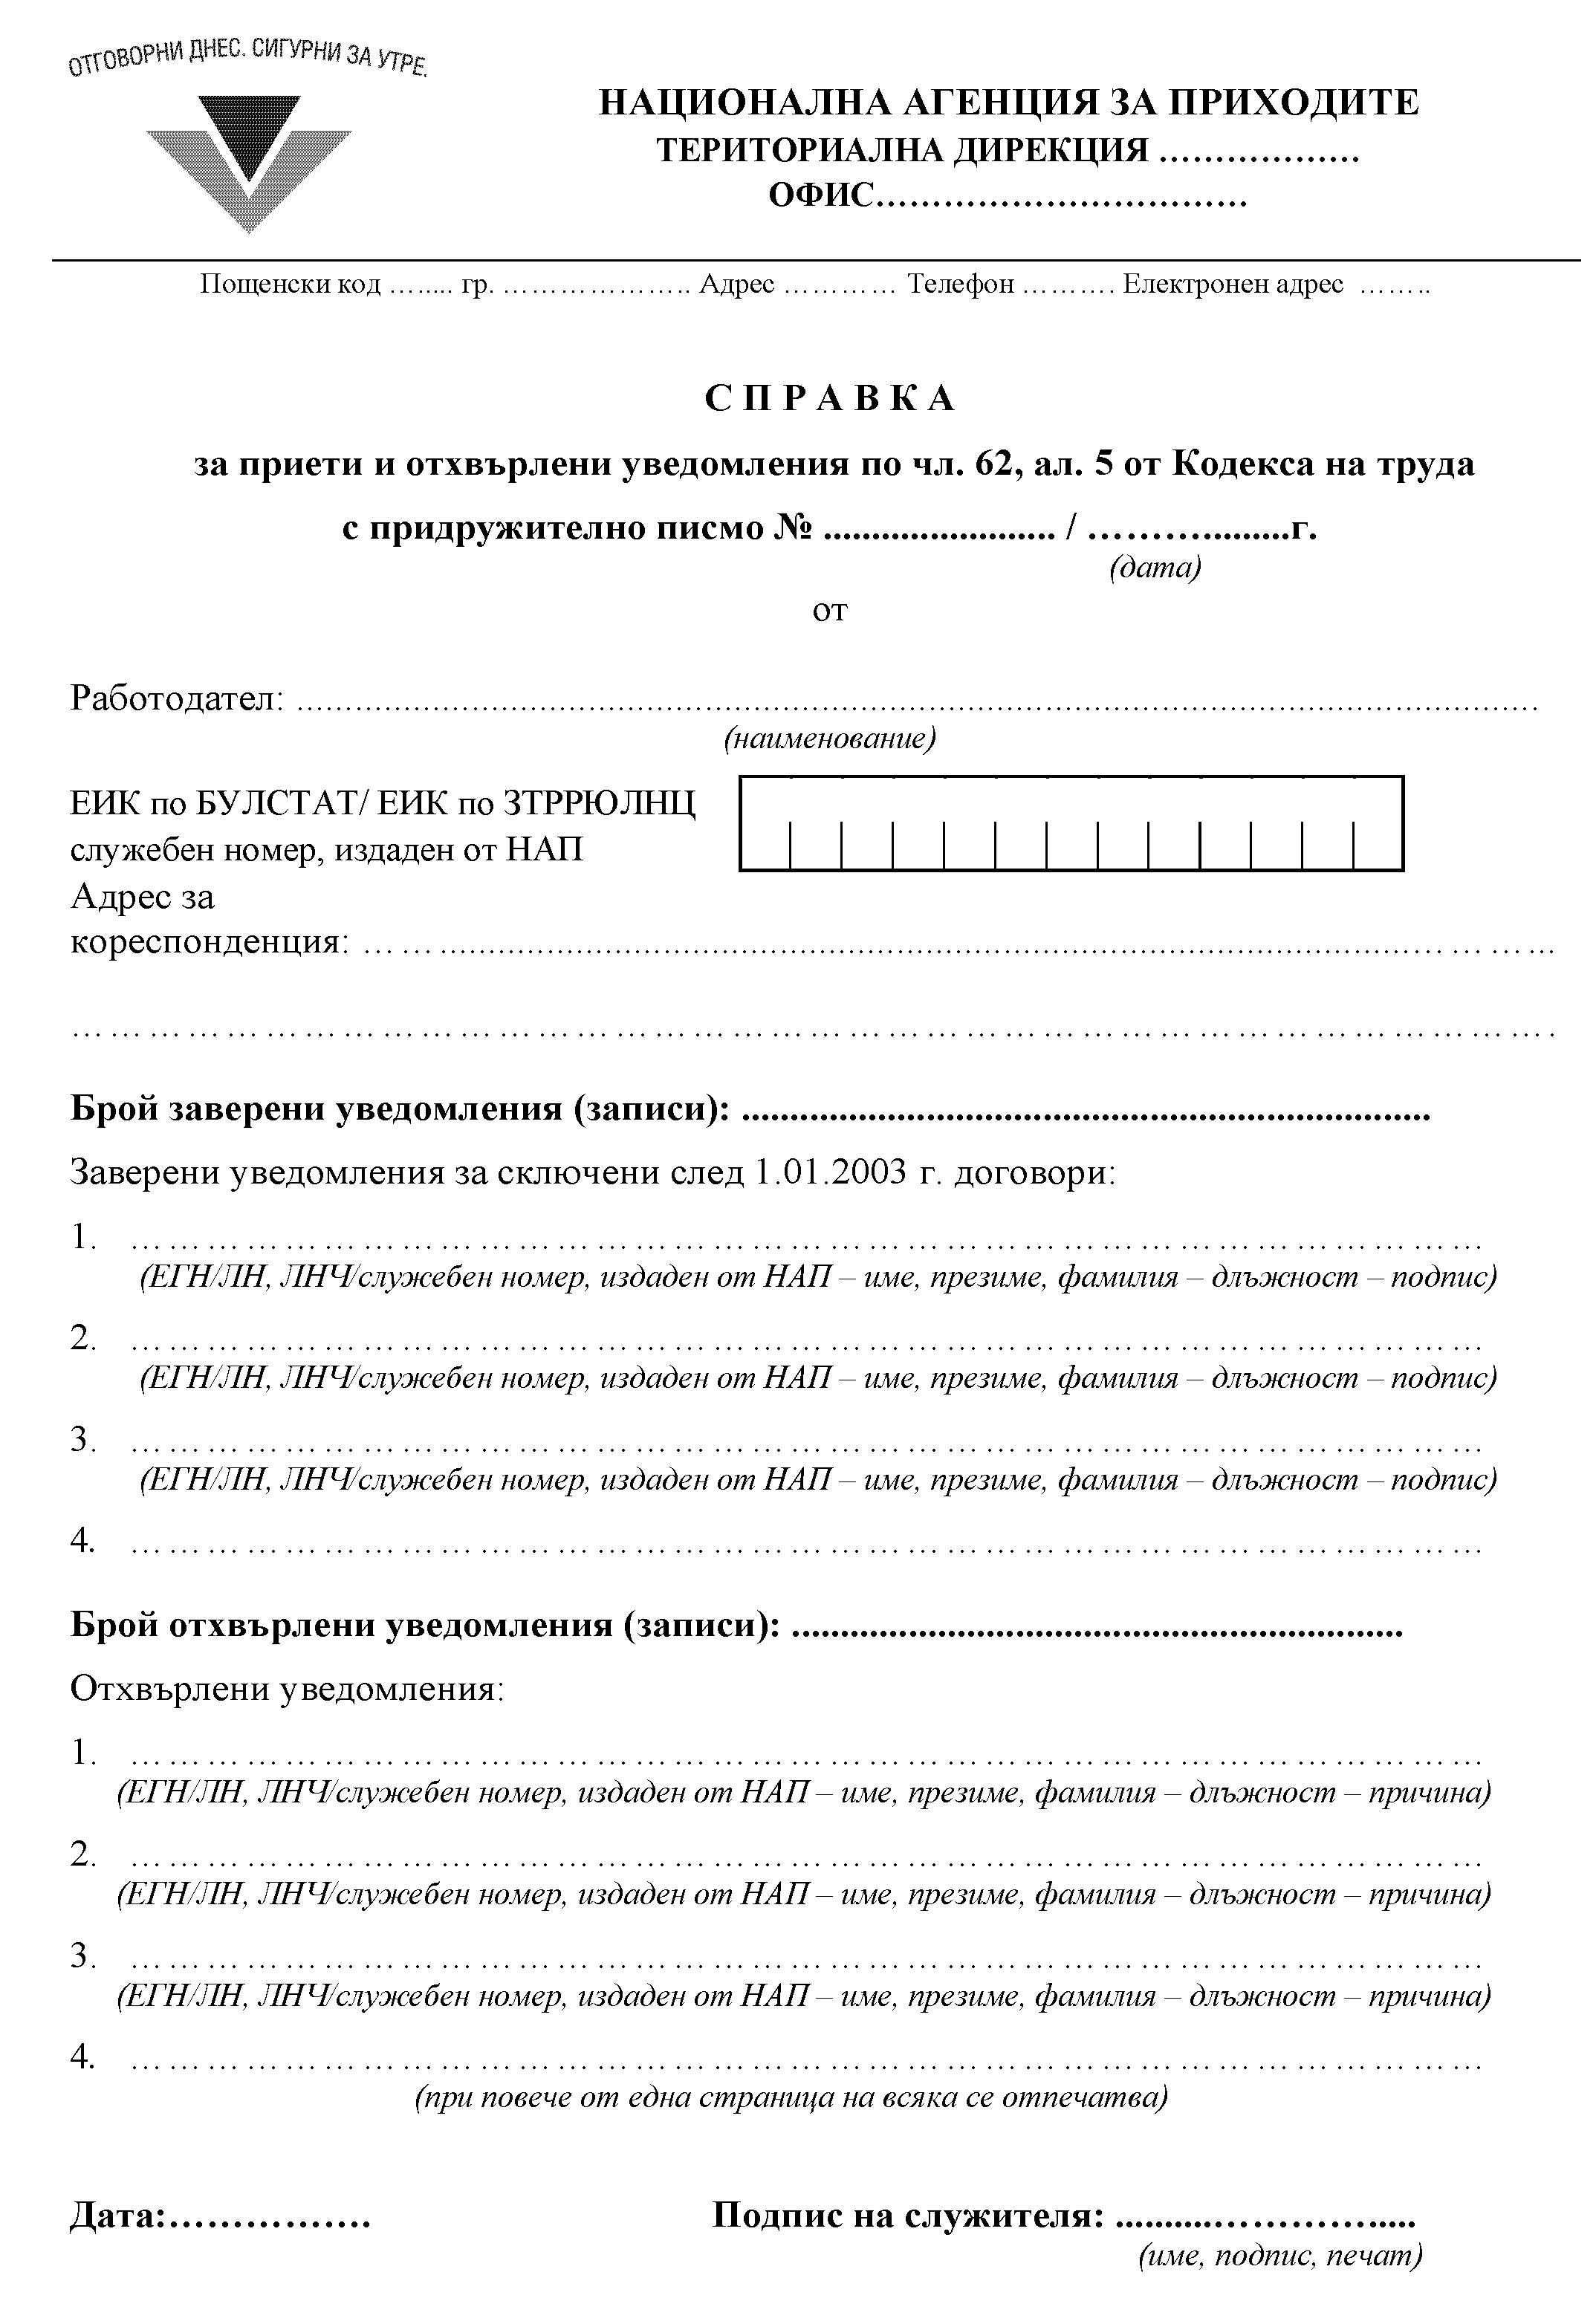 Приложение № 3 към чл. 4, ал. 1